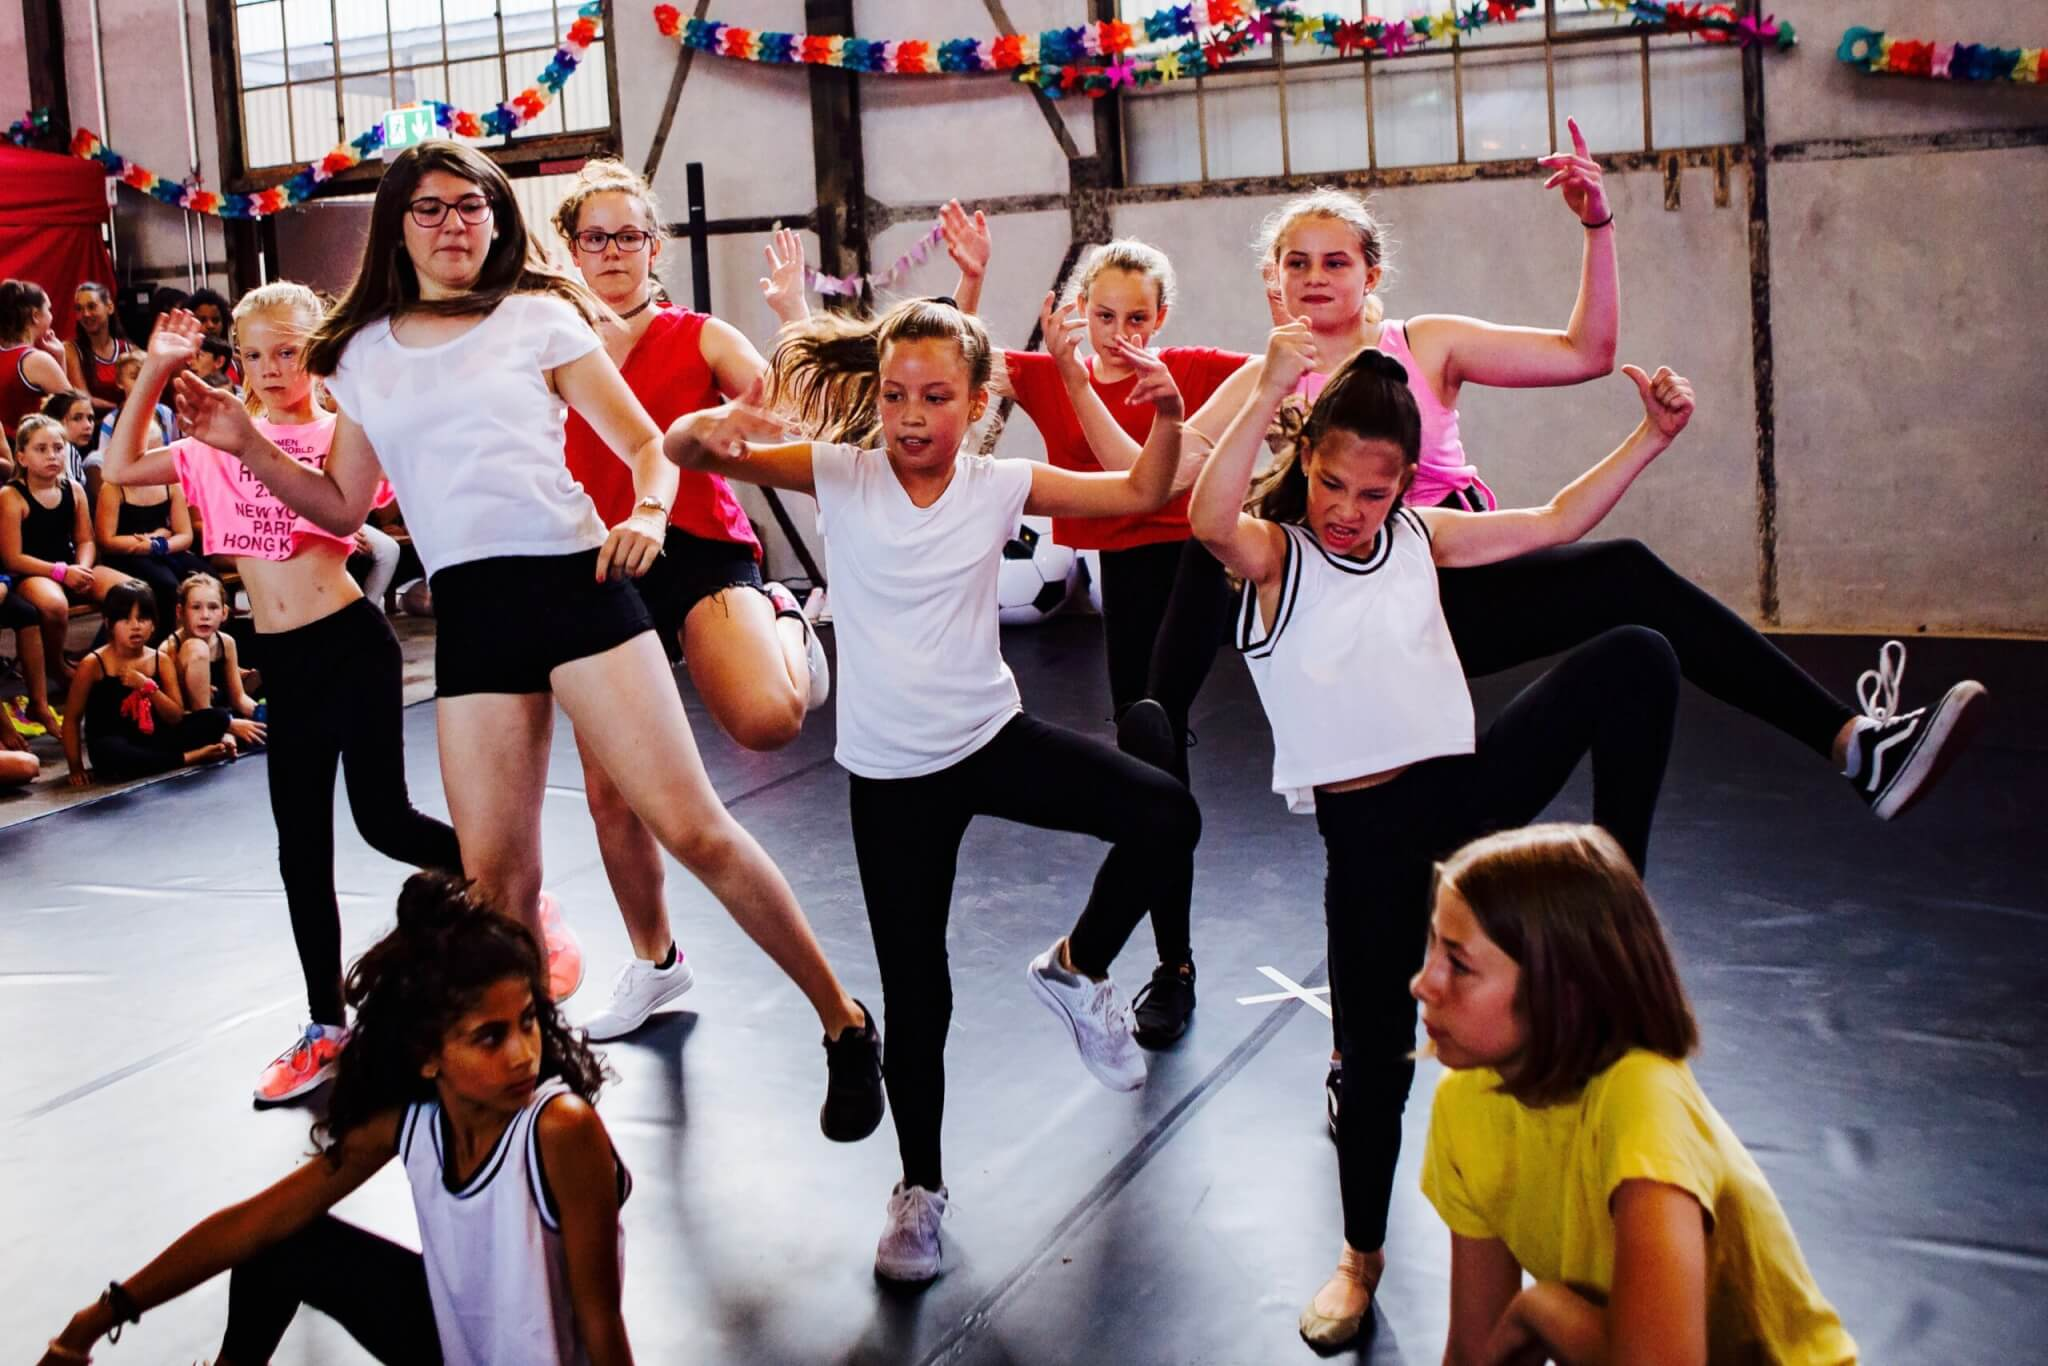 Jugendfest | NatMove Show | 📷 Christoph Gurtner | stagetime.ch